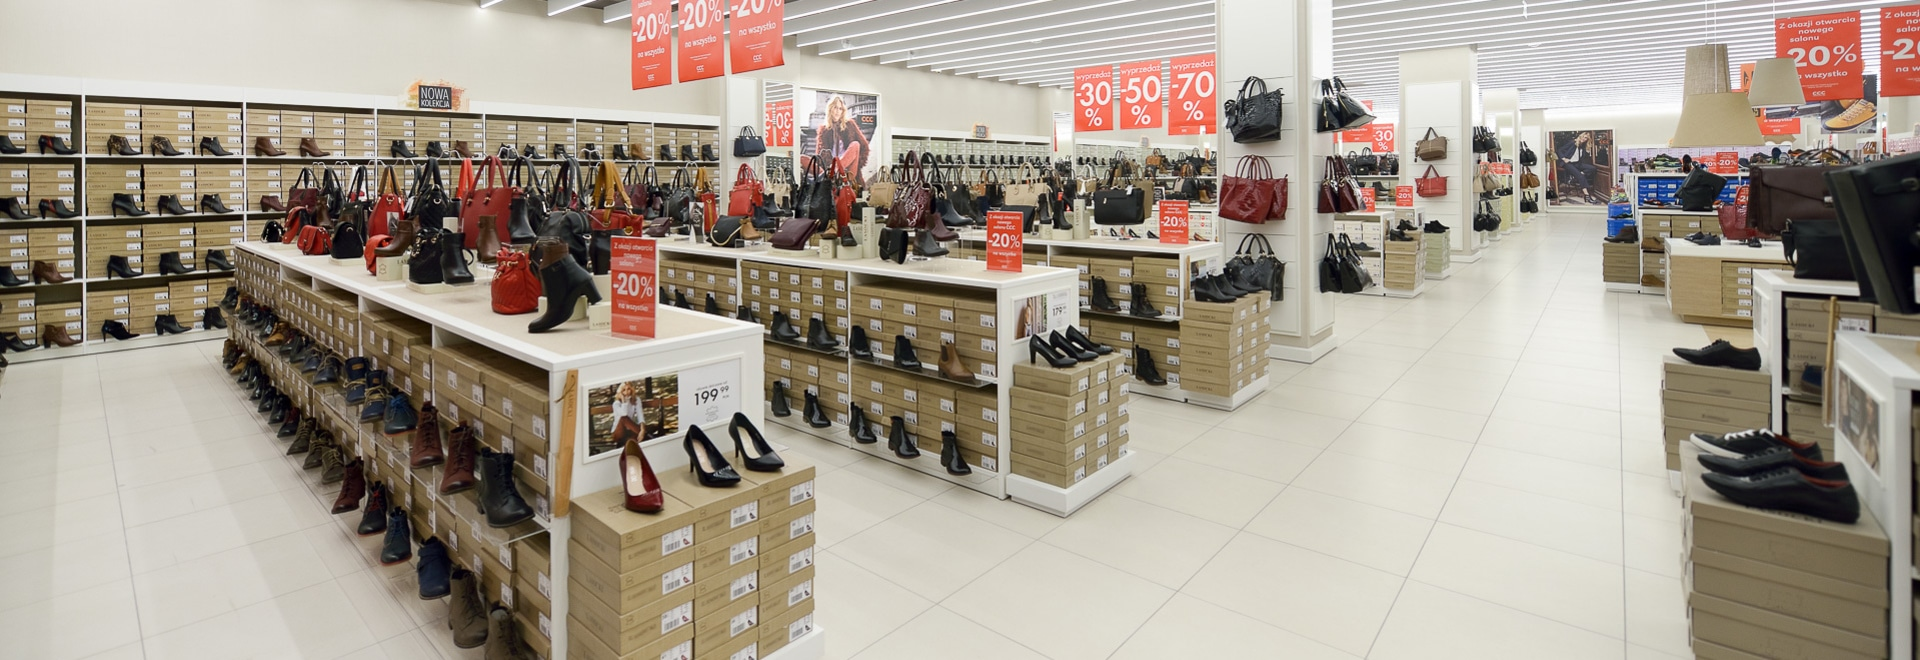 CCC Store, Gliwice, Poland